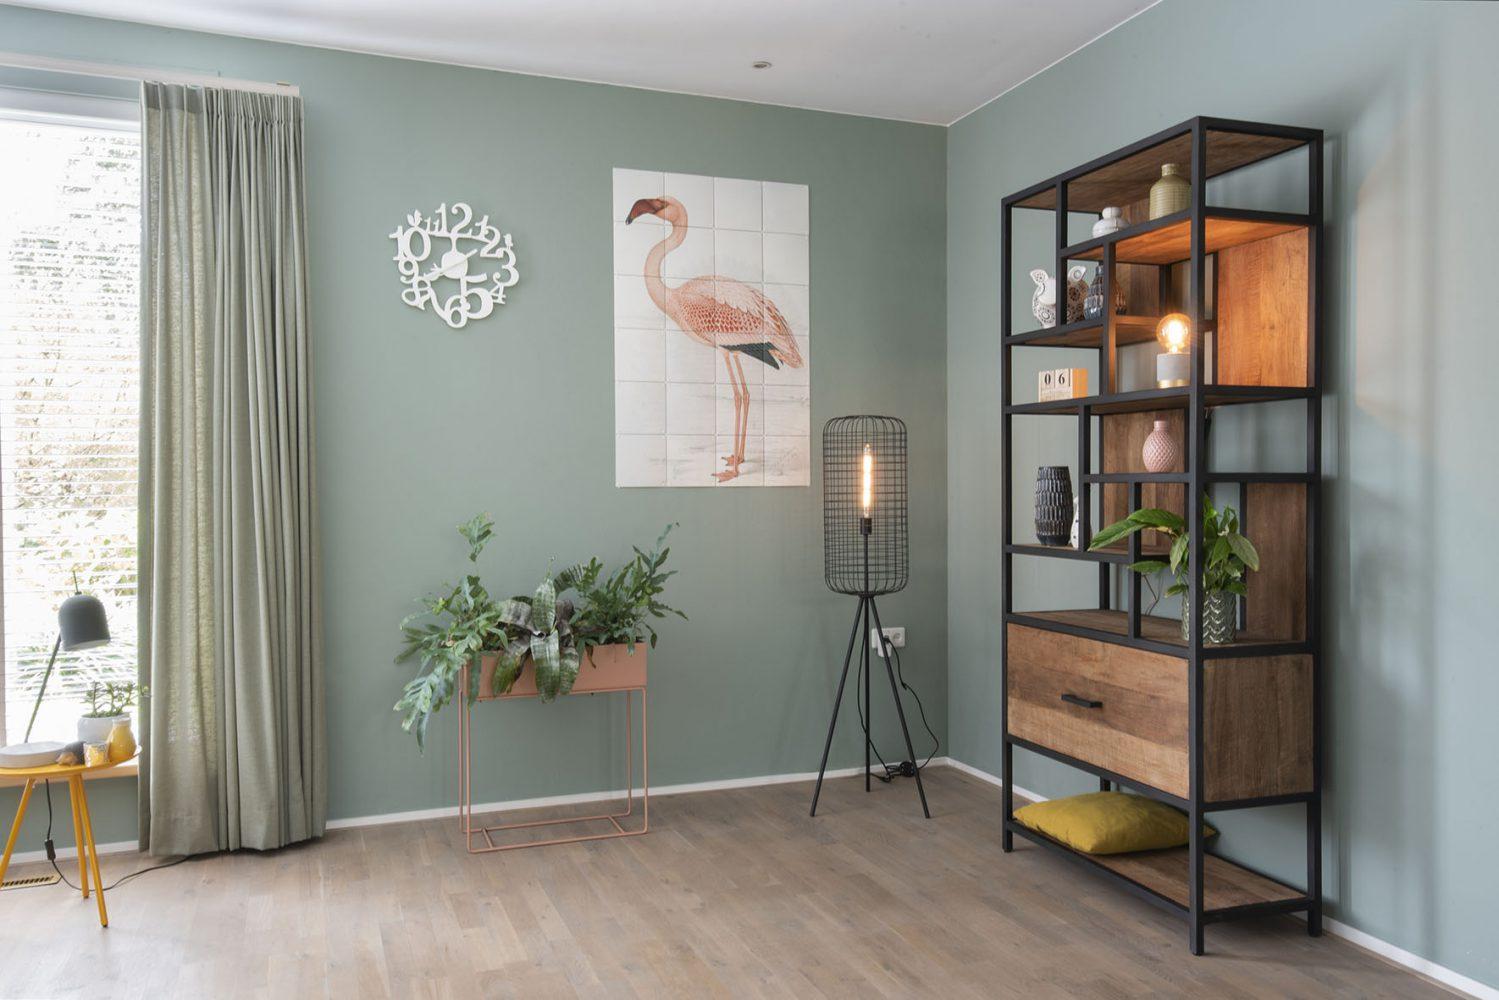 Huiskamer interieuradvies Drunen styling binnenhuisarchitect